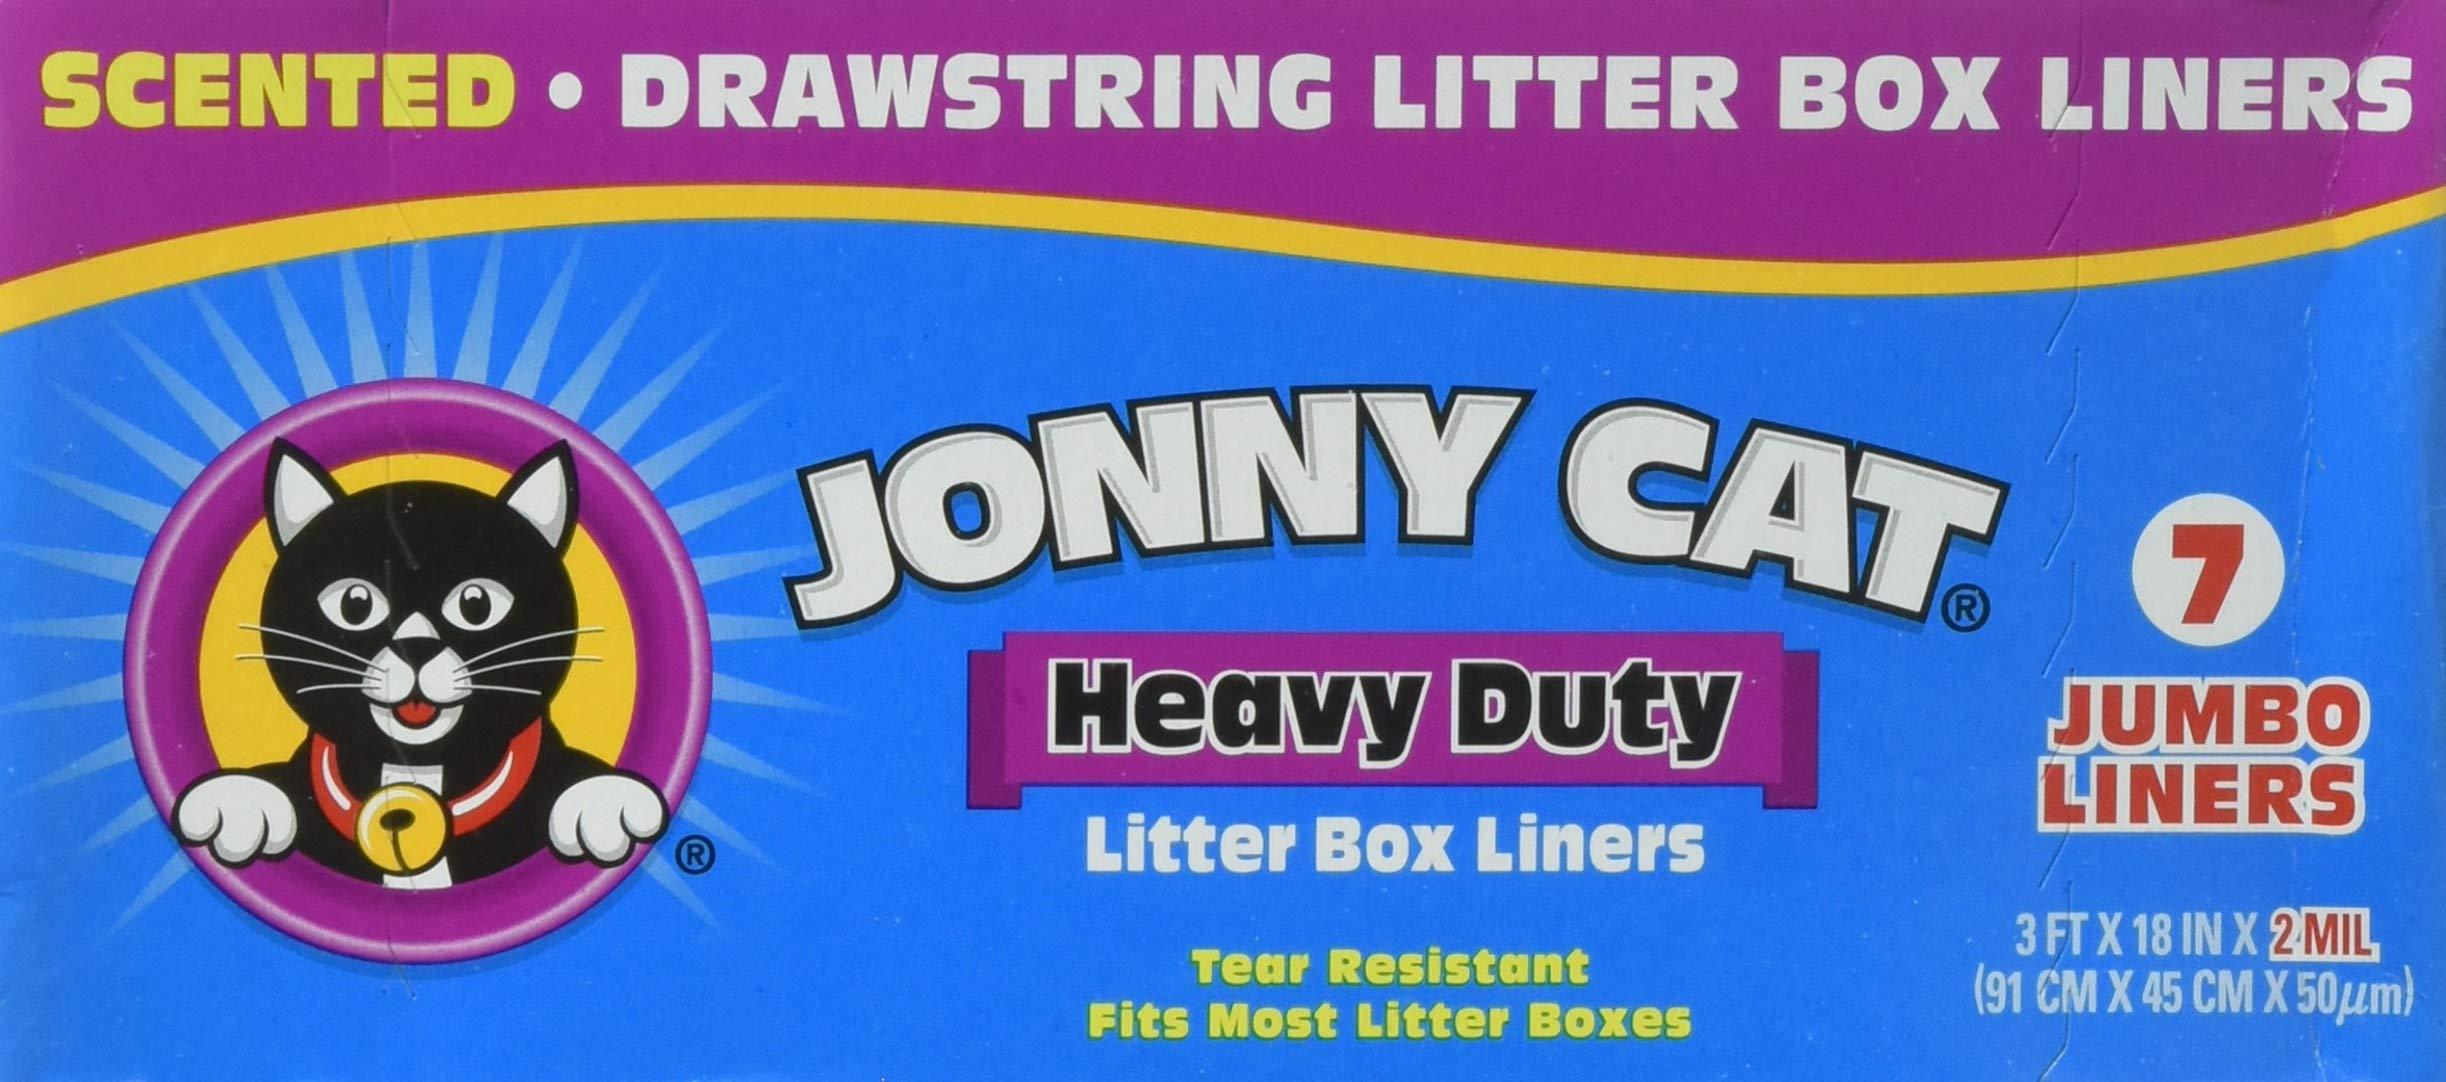 Jonny Cat Jumbo Scented Drawstring Cat Litter Box Liners -7 Per Box- (2 Pack/boxes) by Jonny Cat